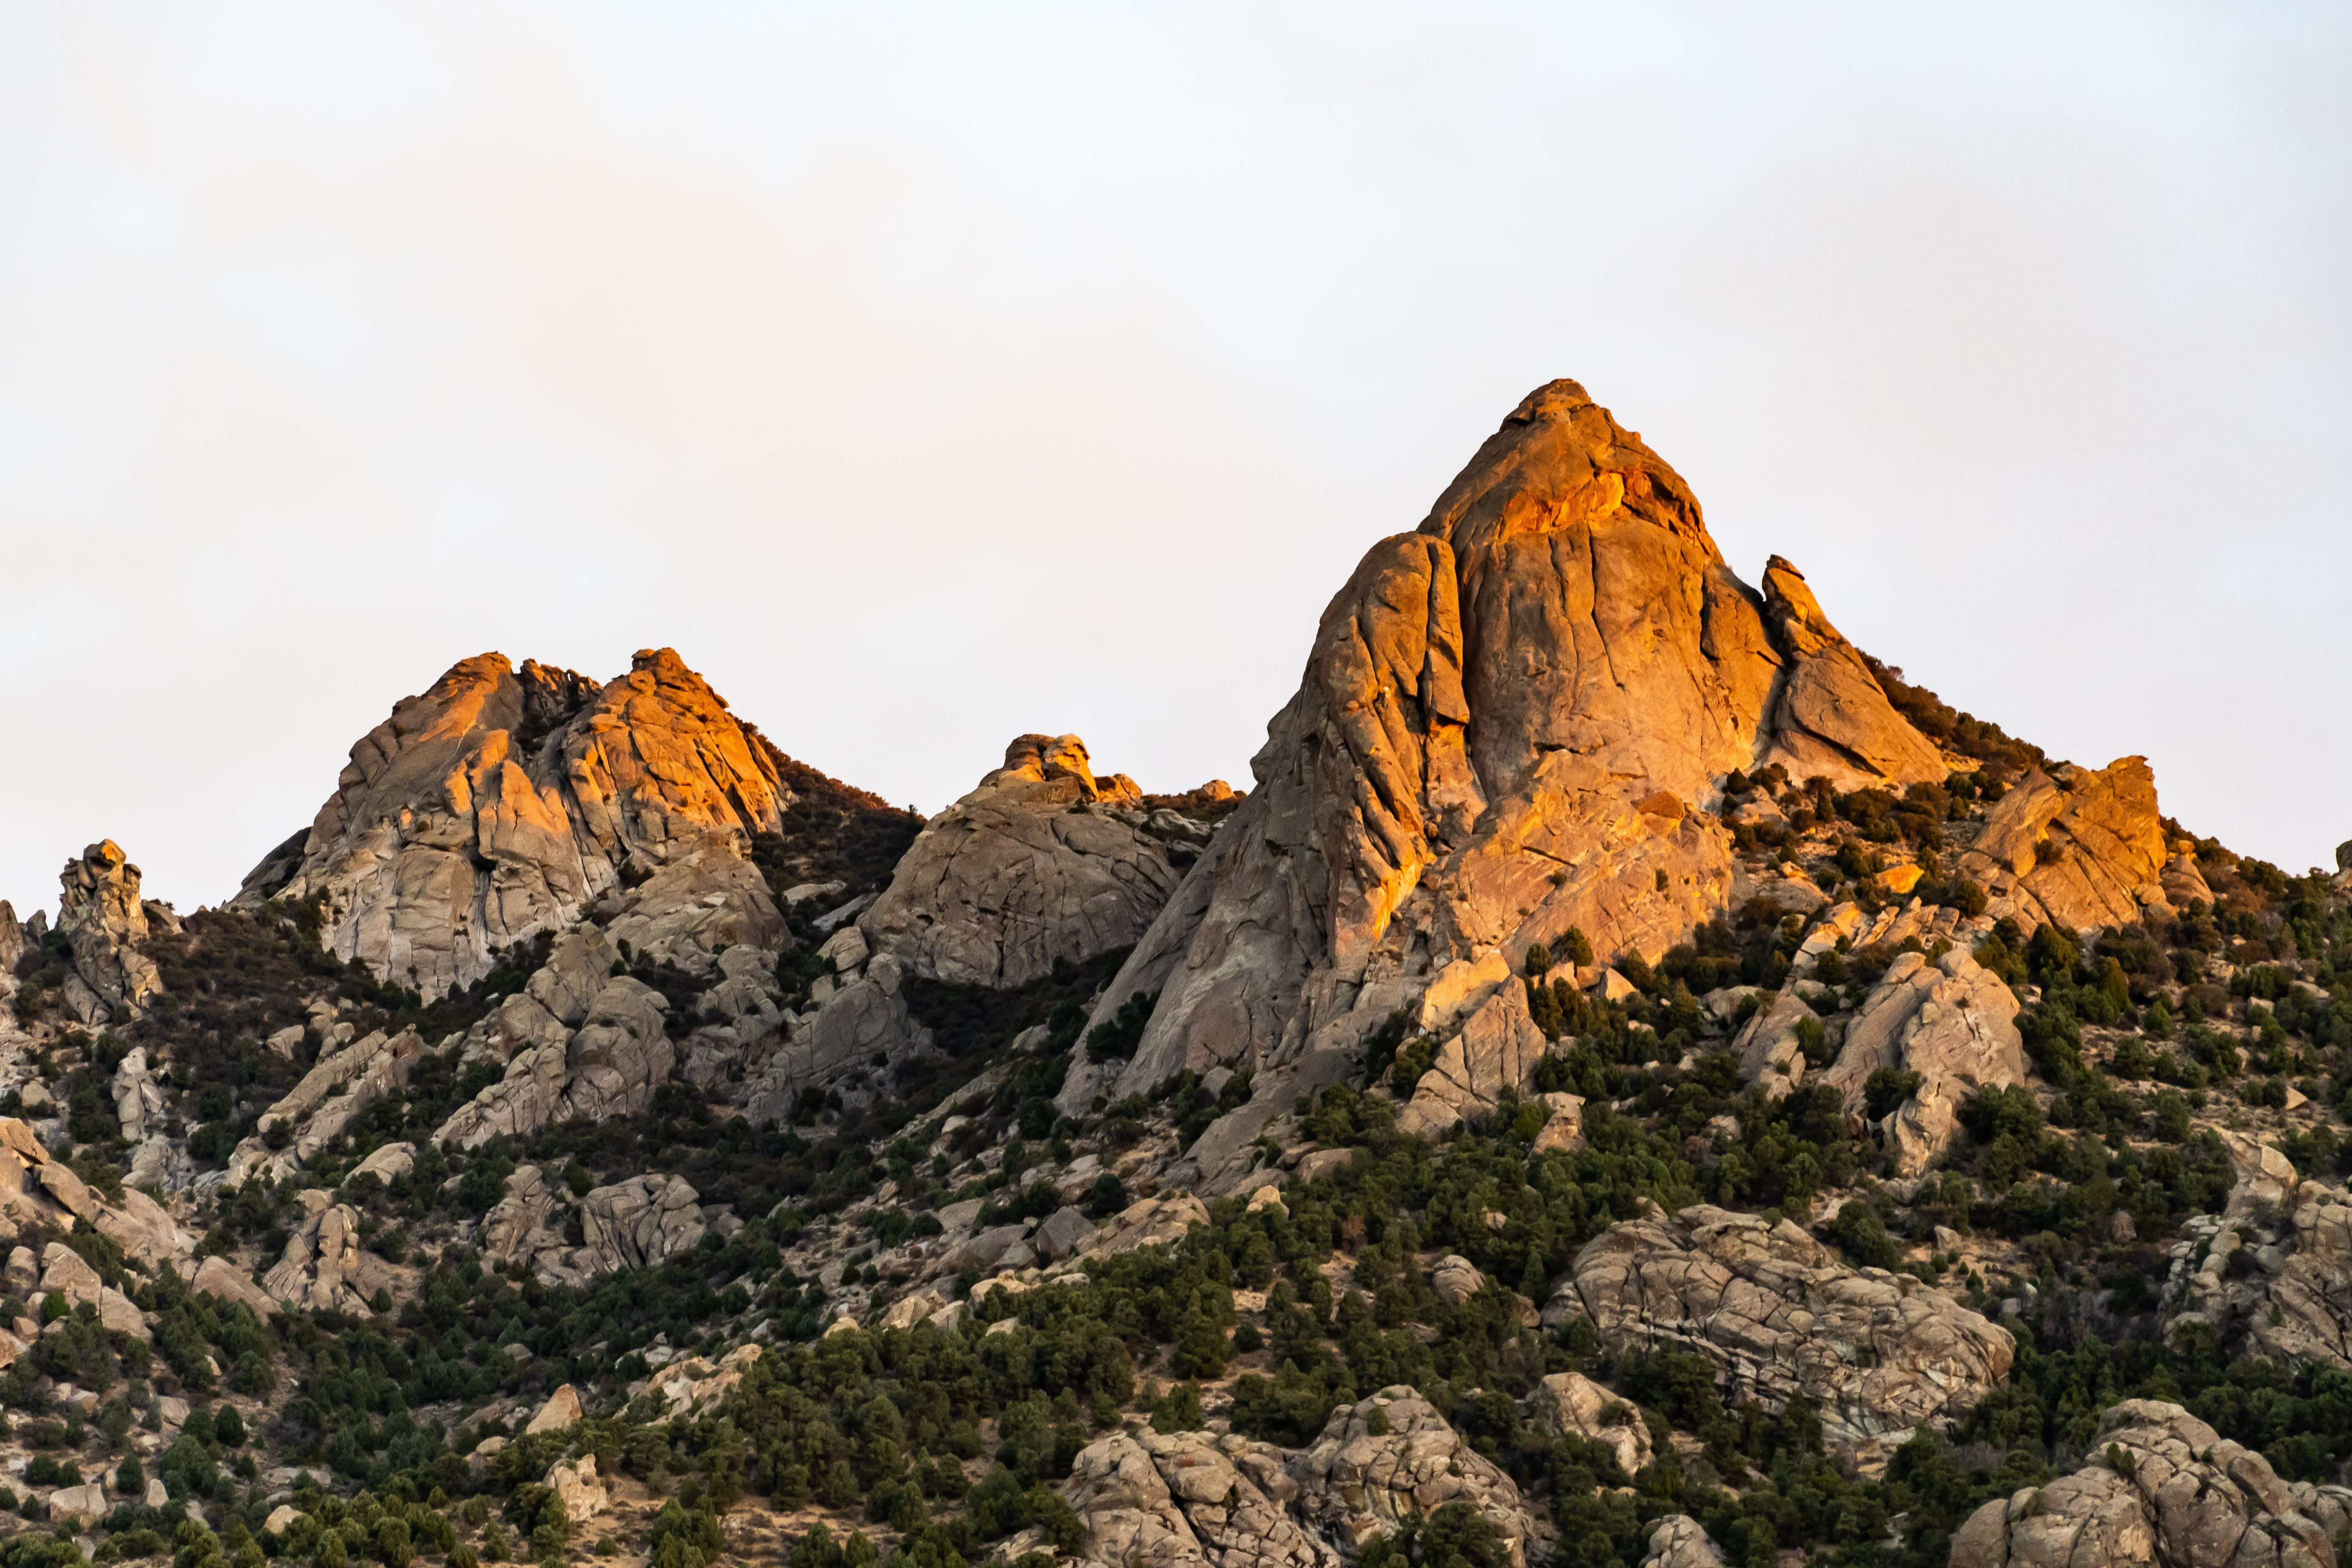 Gratis lagerfoto af 4k-baggrund, bjerg, bjergtinde, bjergtop